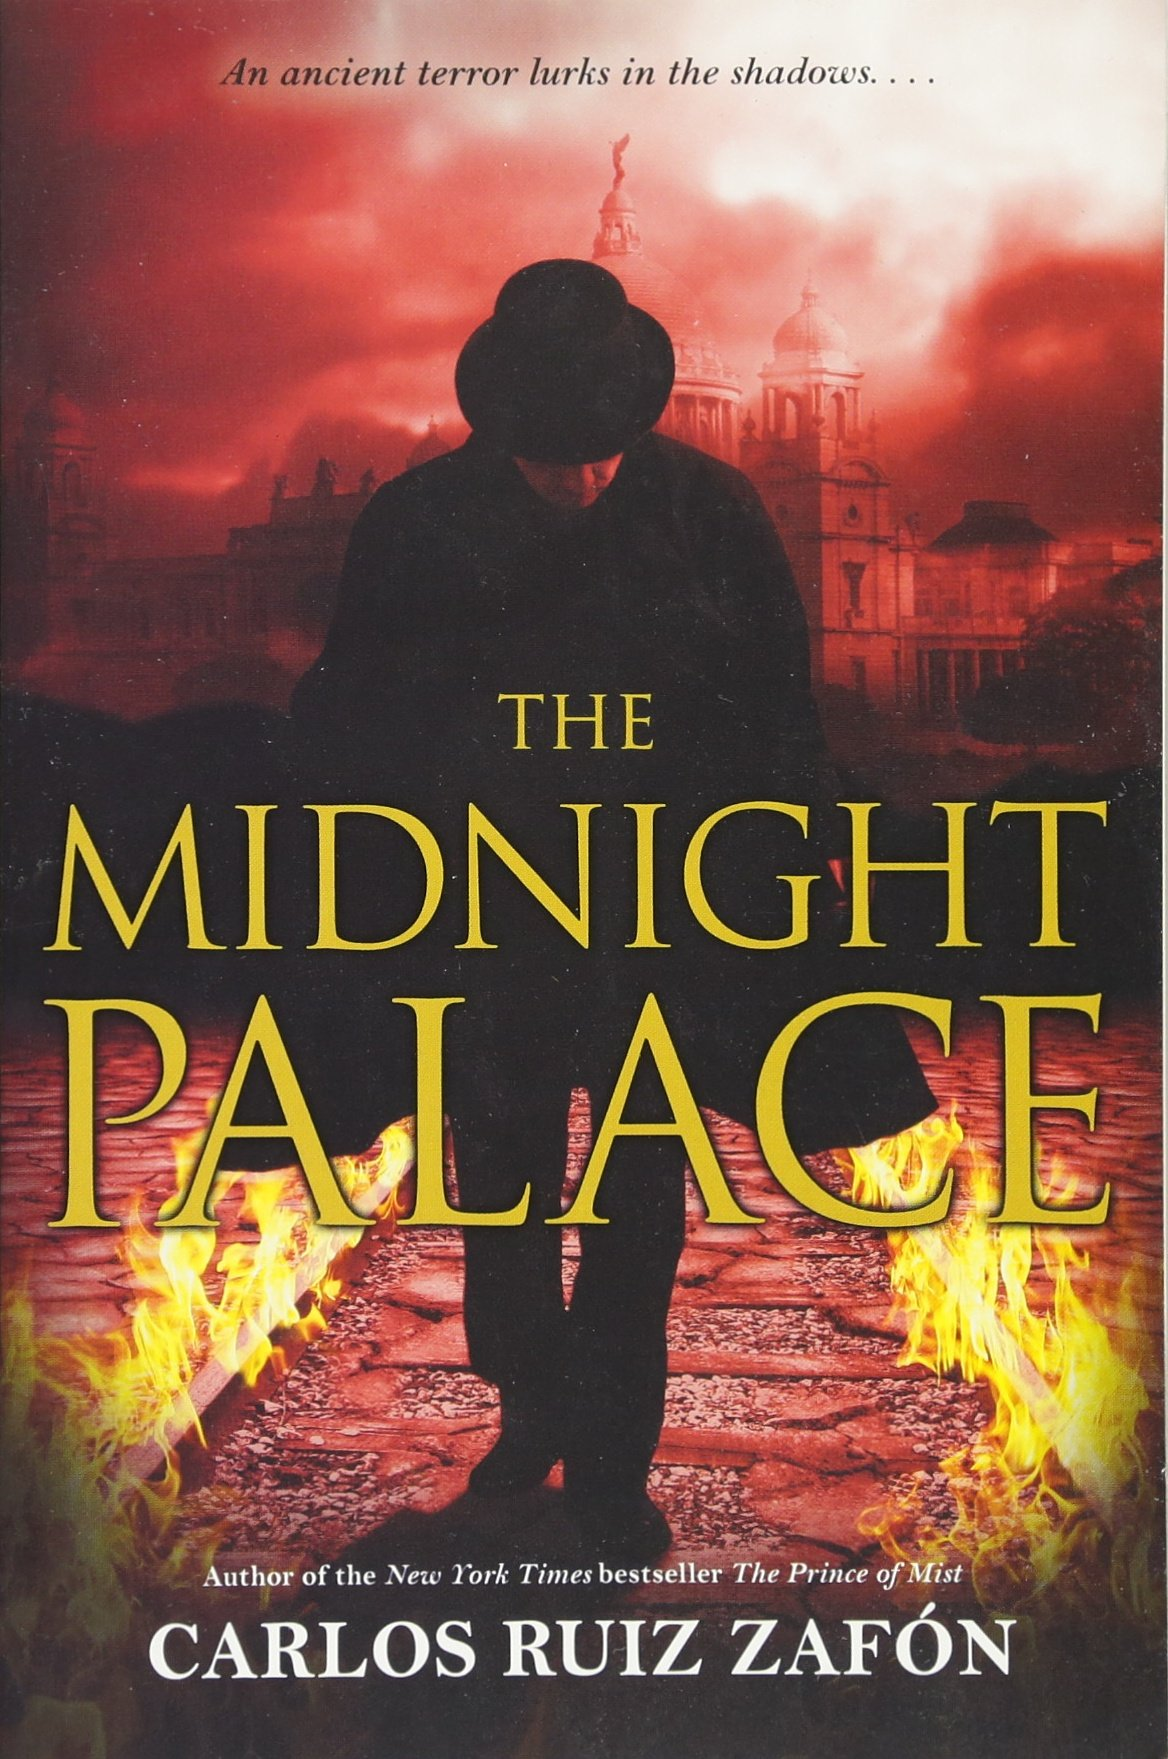 Amazon: The Midnight Palace (9780316044745): Carlos Ruiz Zafon: Books